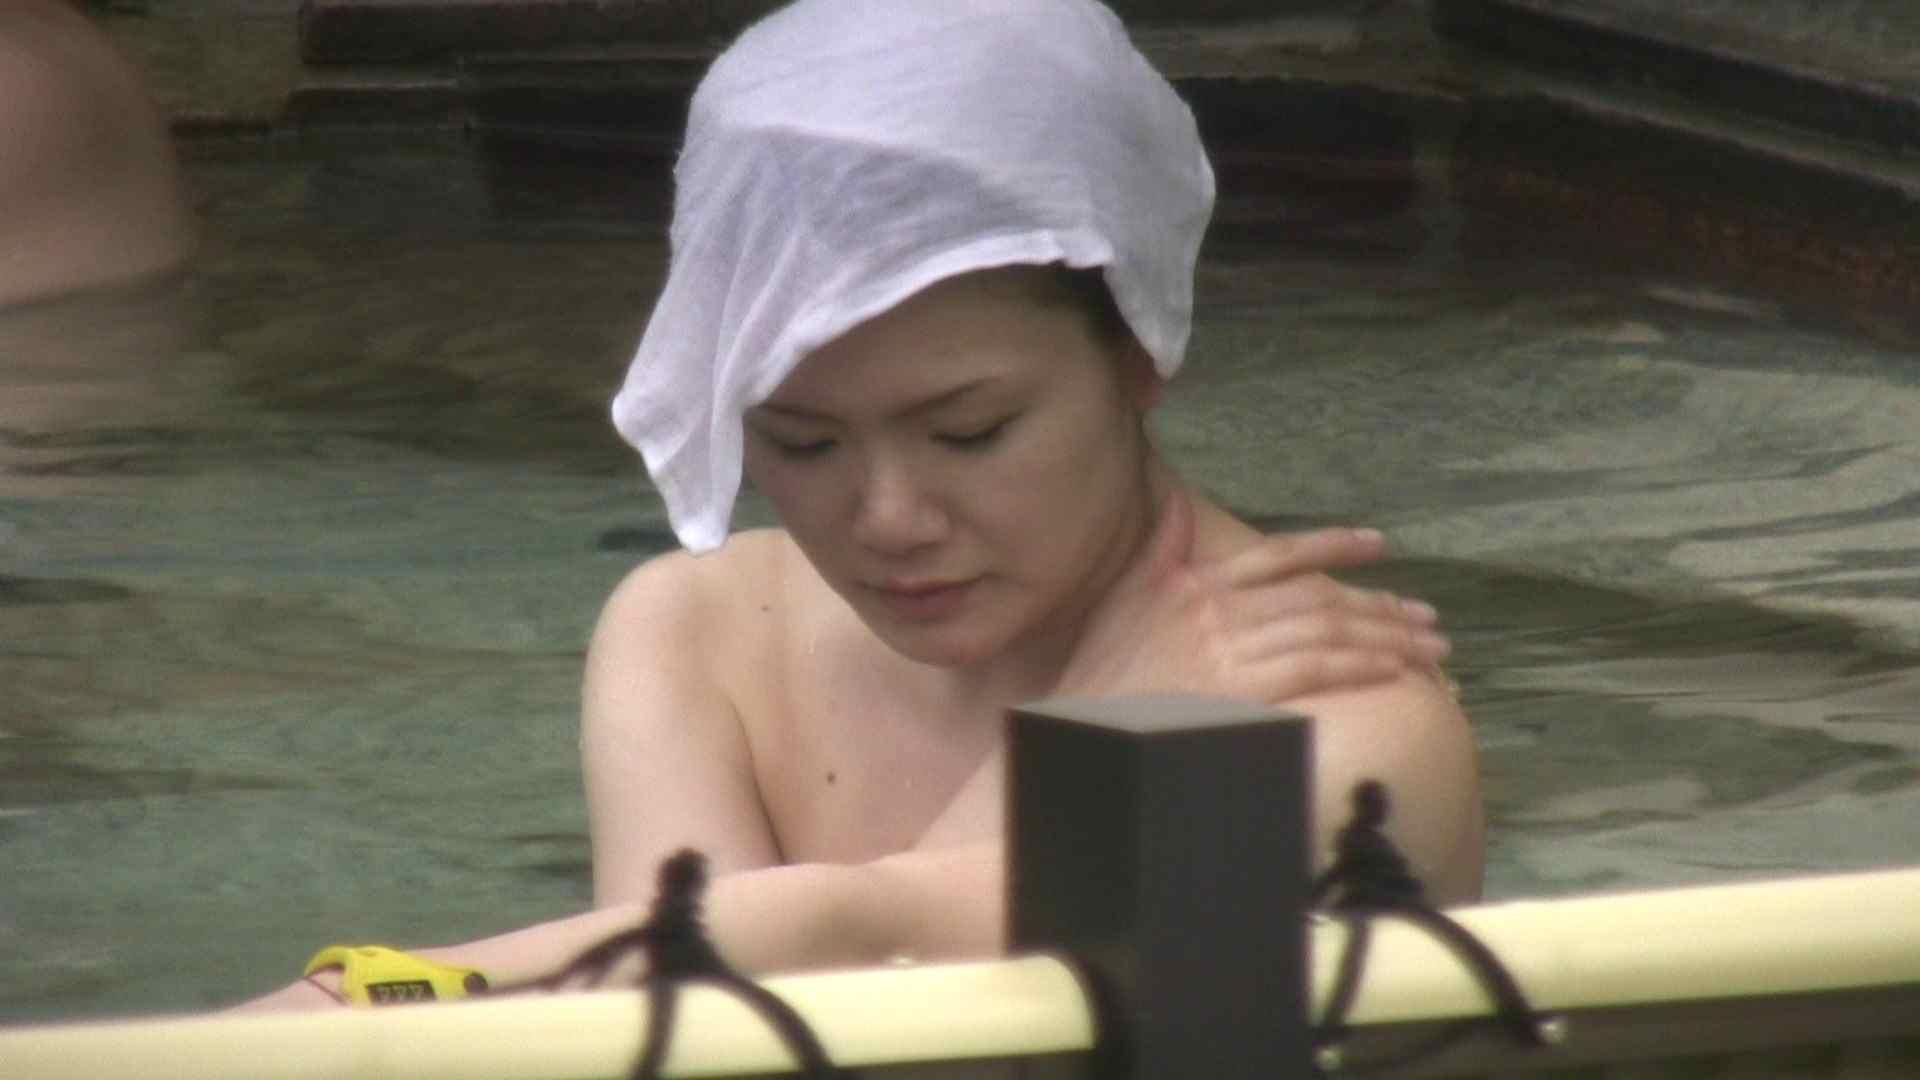 Aquaな露天風呂Vol.12【VIP】 HなOL | 盗撮  83pic 49